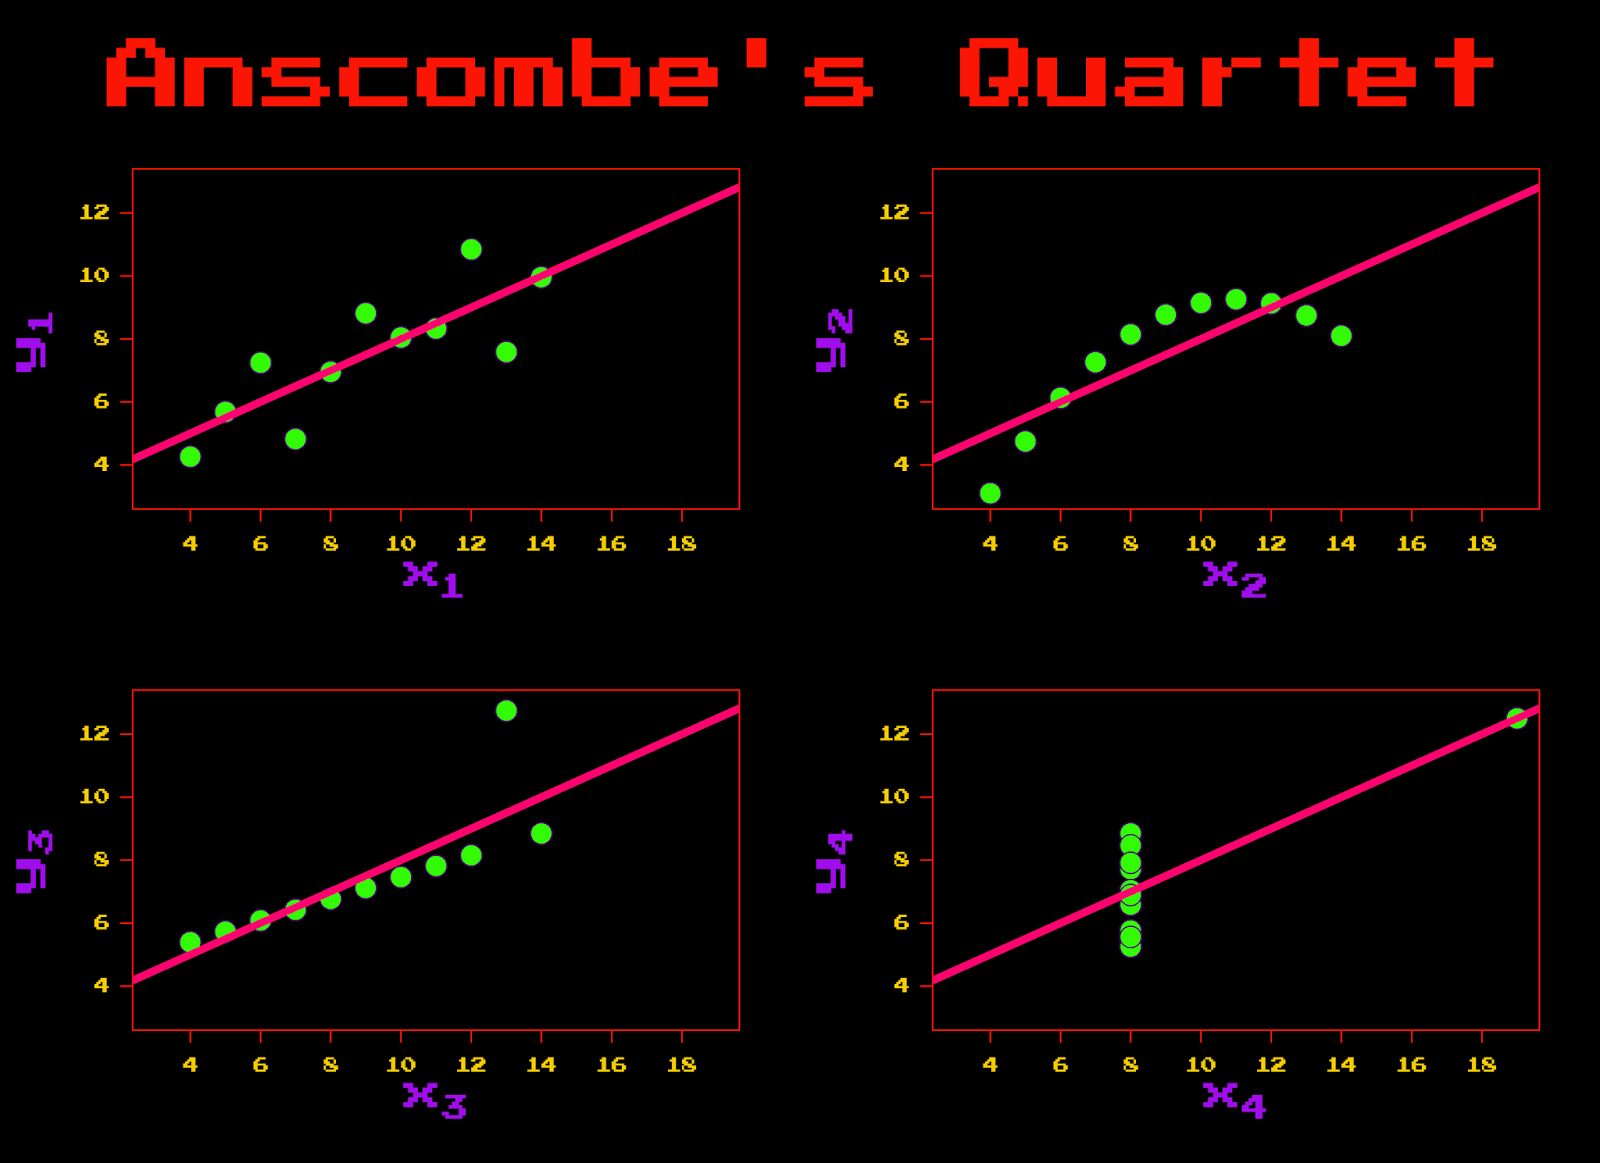 Anscombe's Quartet: 1980's Edition